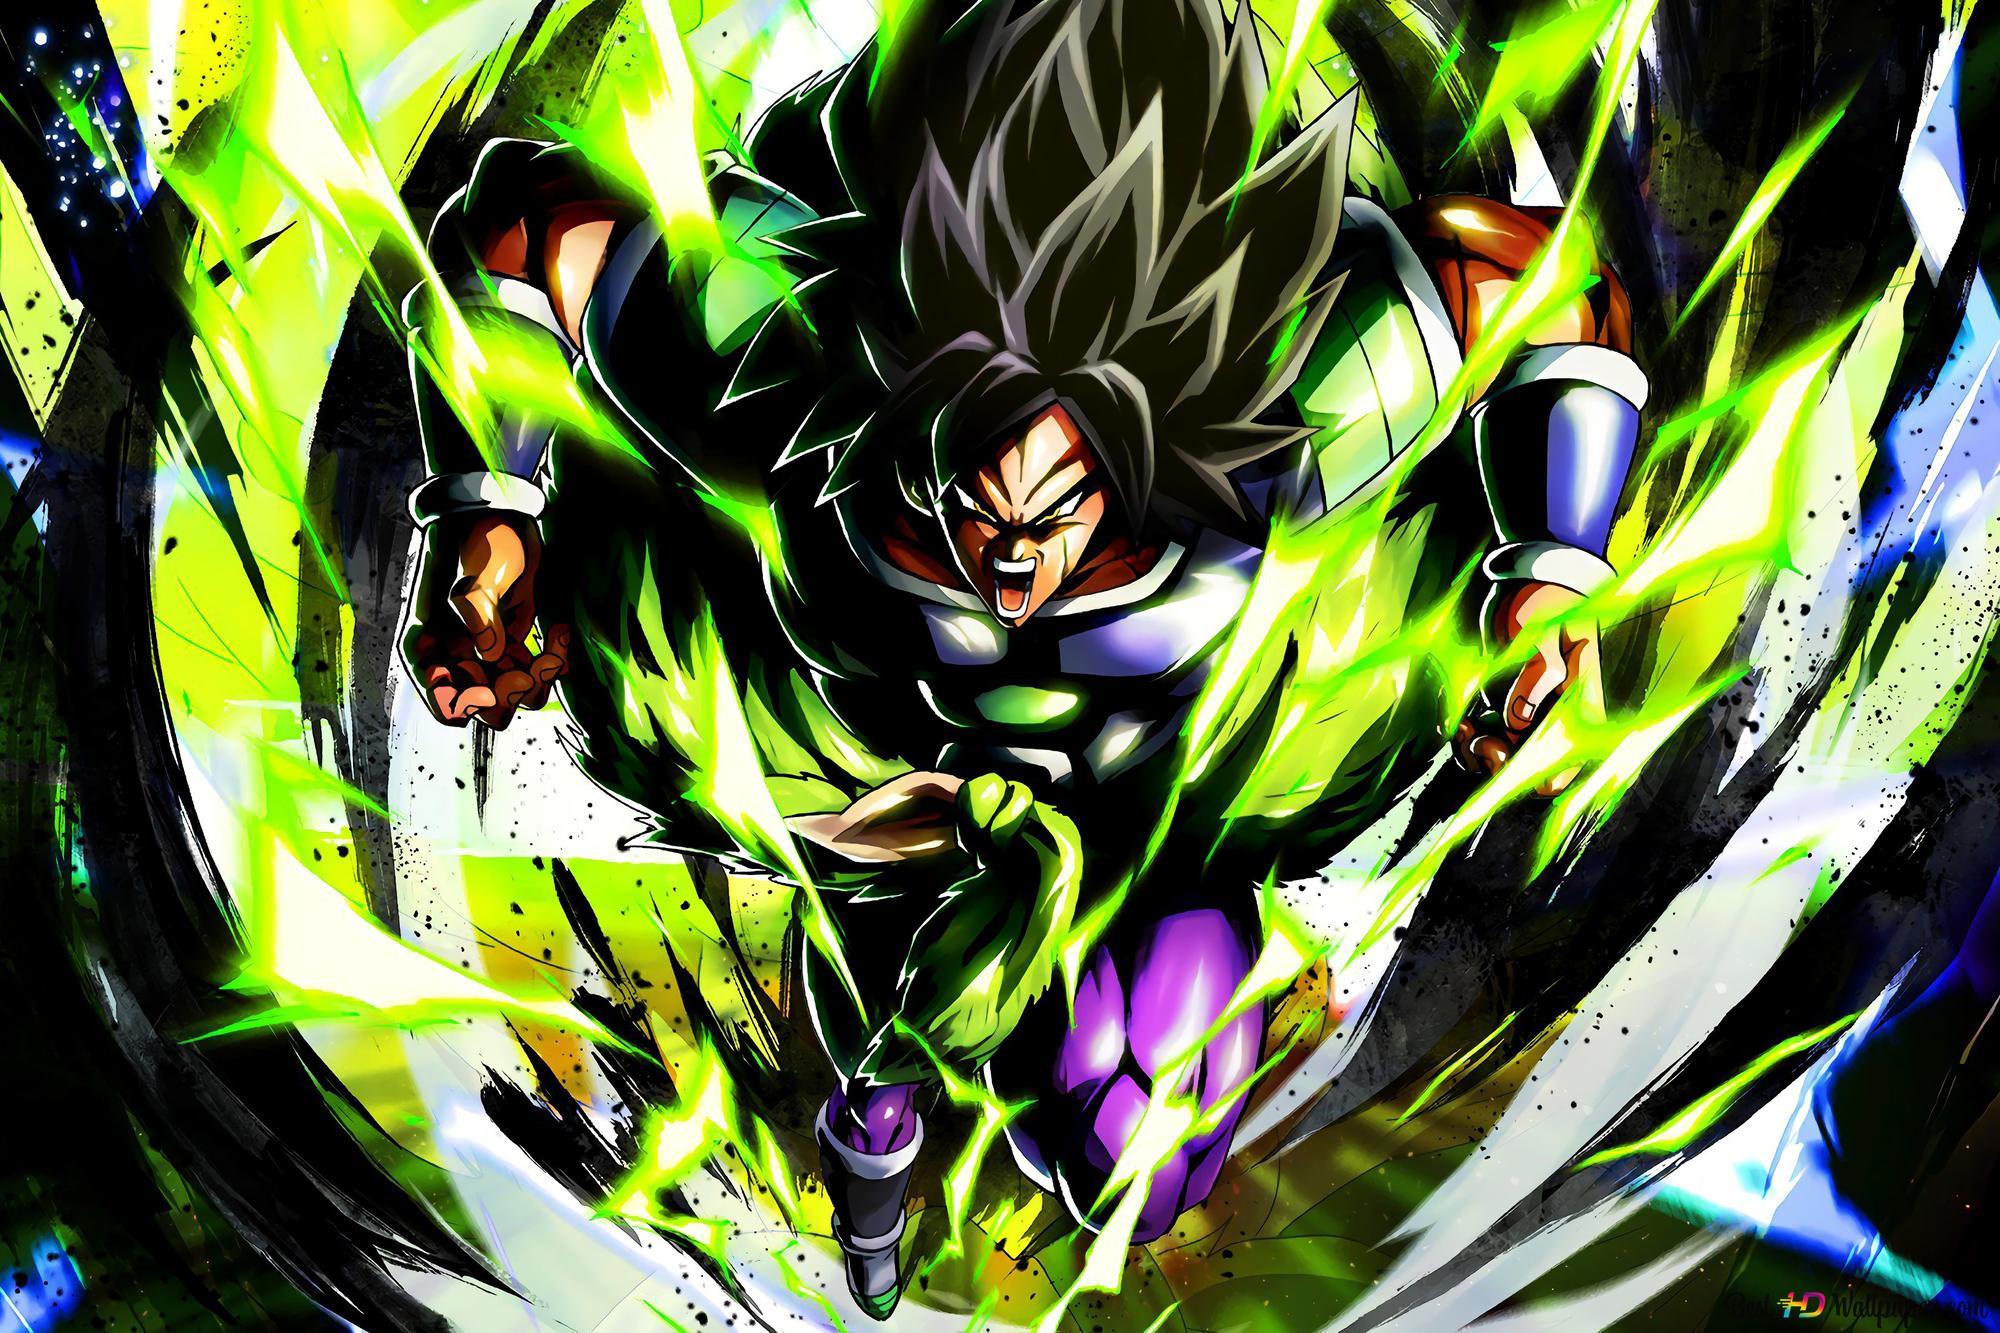 Dragon Ball Super Broly Movie - Broly HD wallpaper download